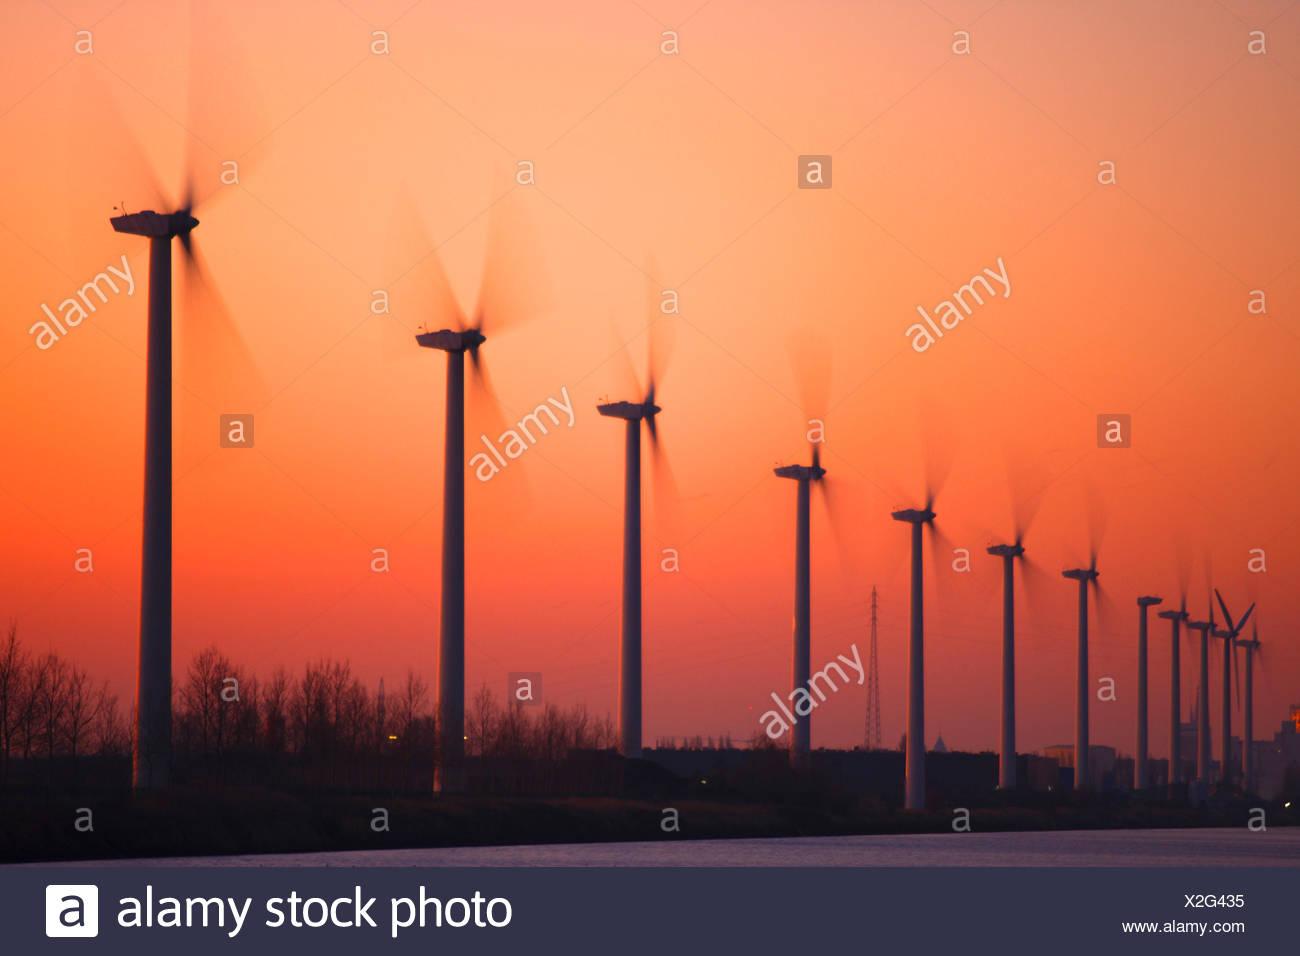 wind mills at sunset, Belgium - Stock Image